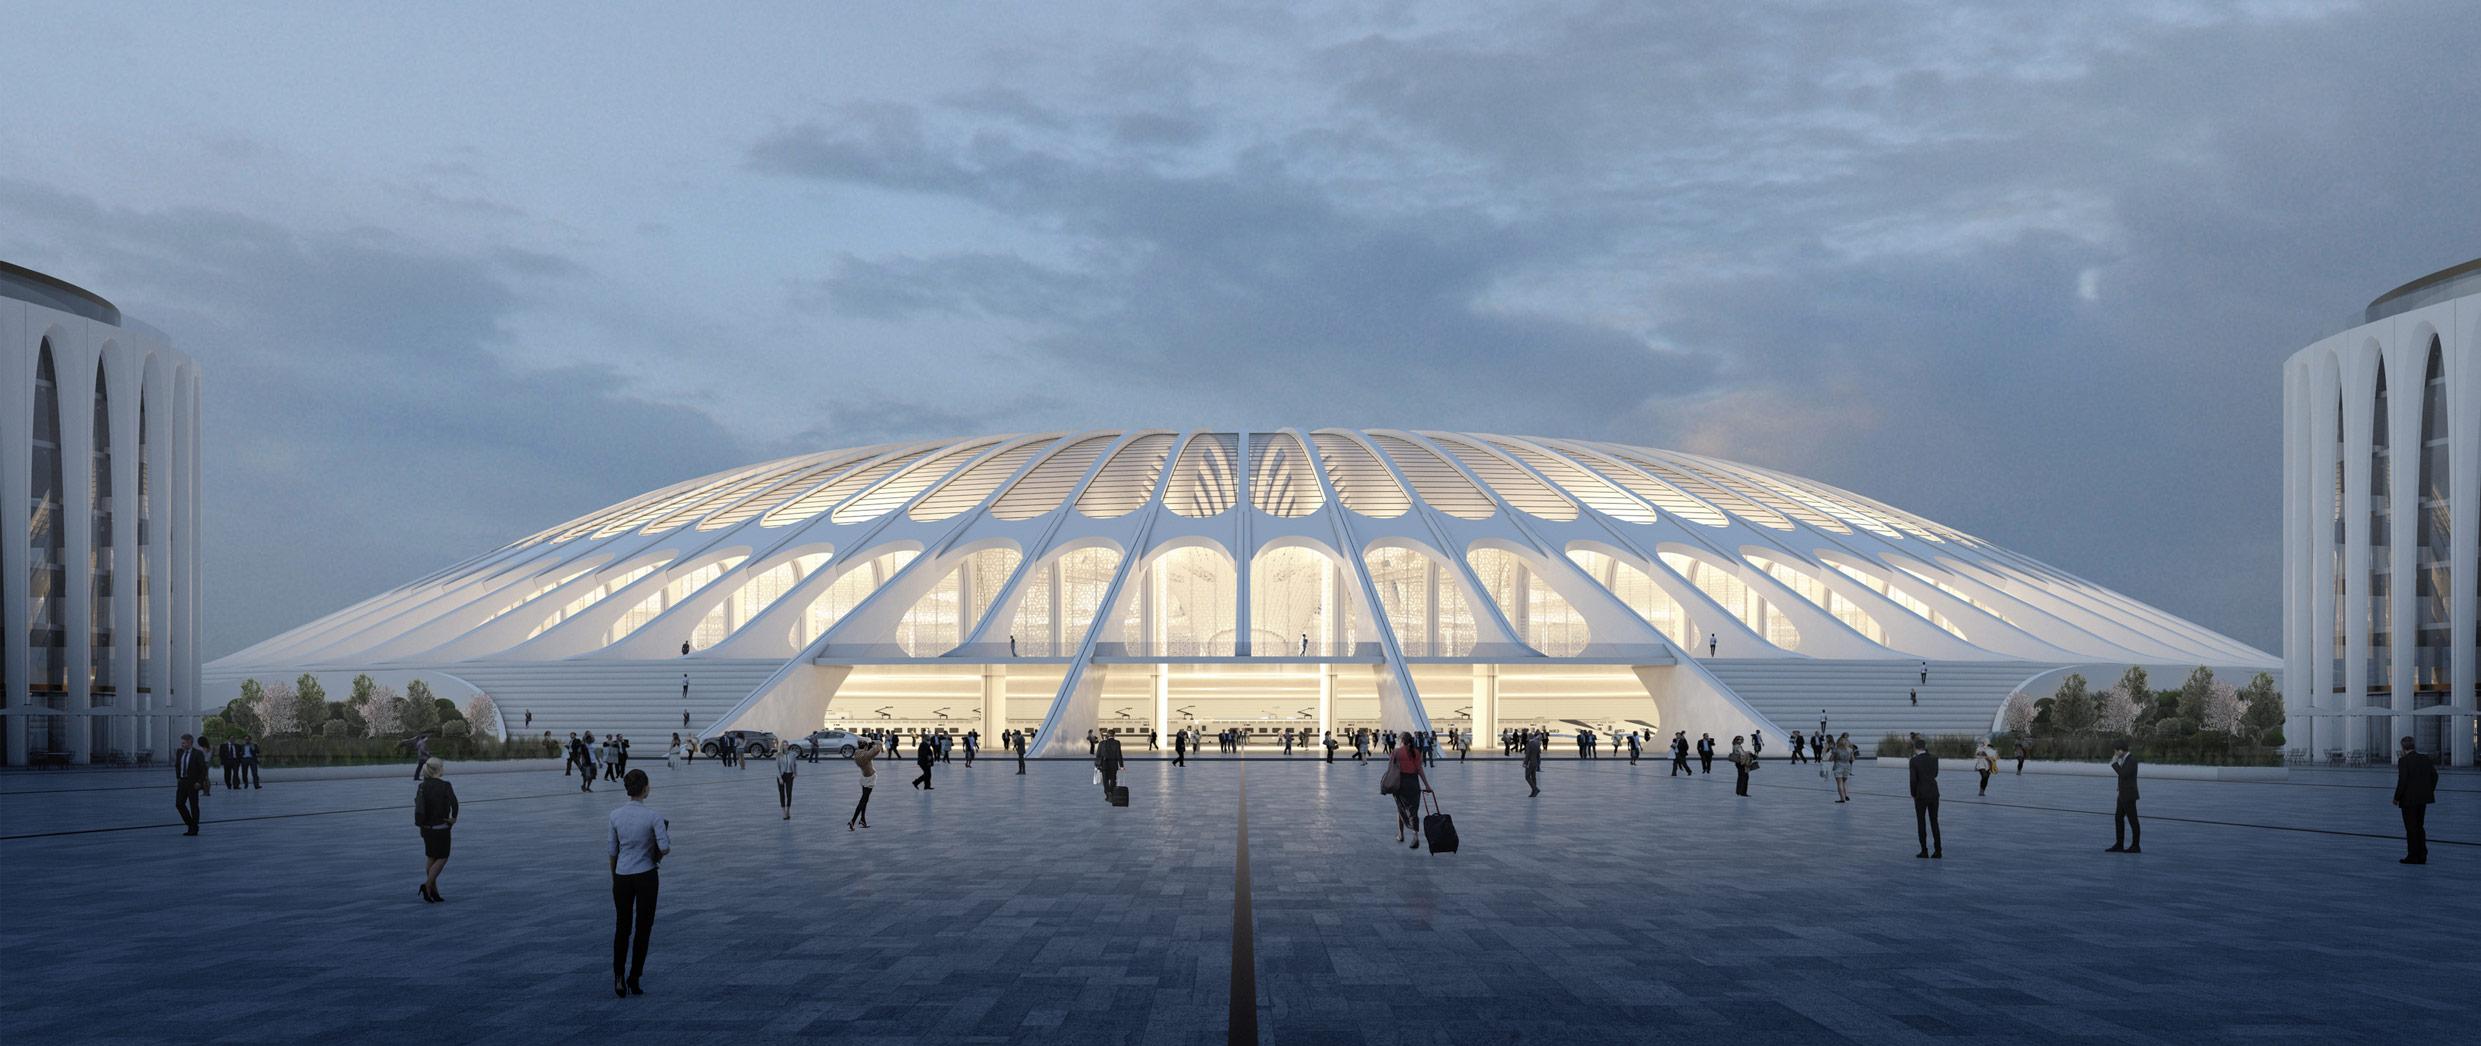 Xi'an Train Station Competition Image by Daniel Szalapski